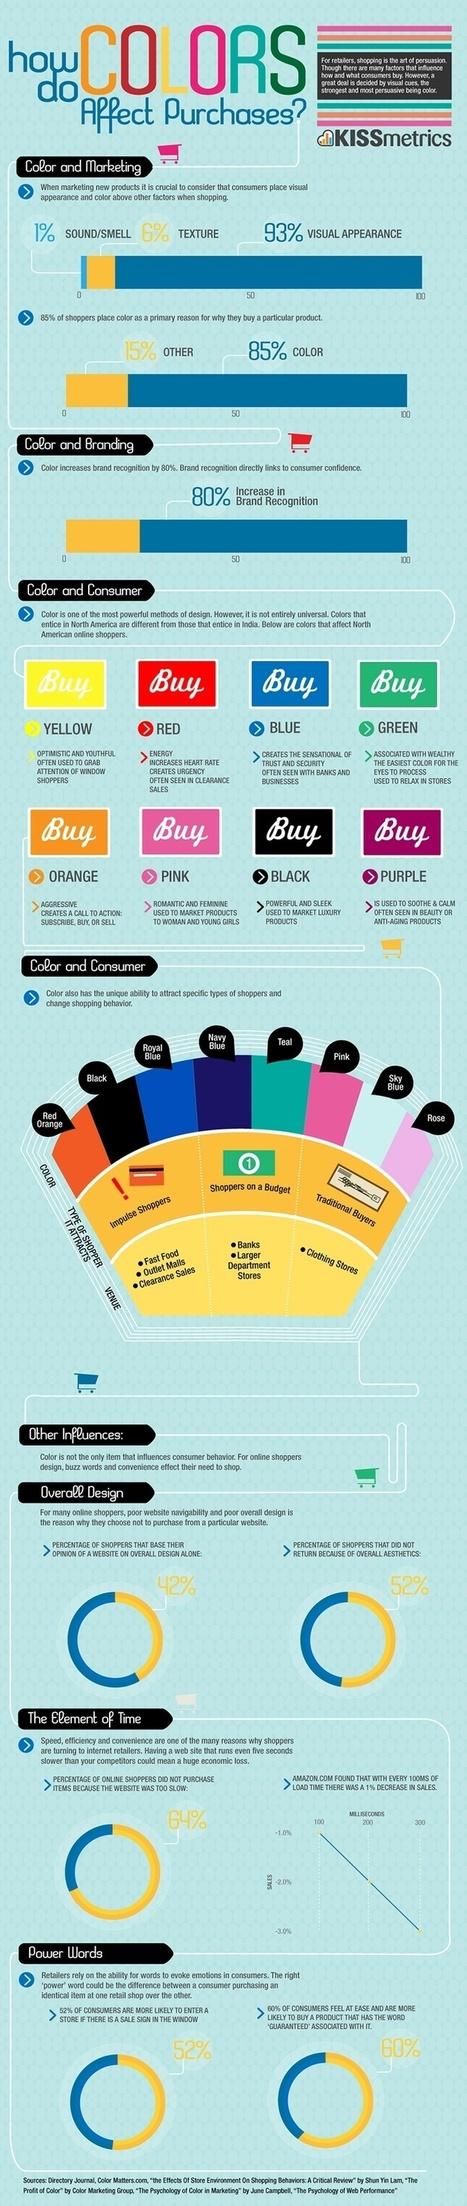 Advertising & Marketing | Neuromarketing | Scoop.it